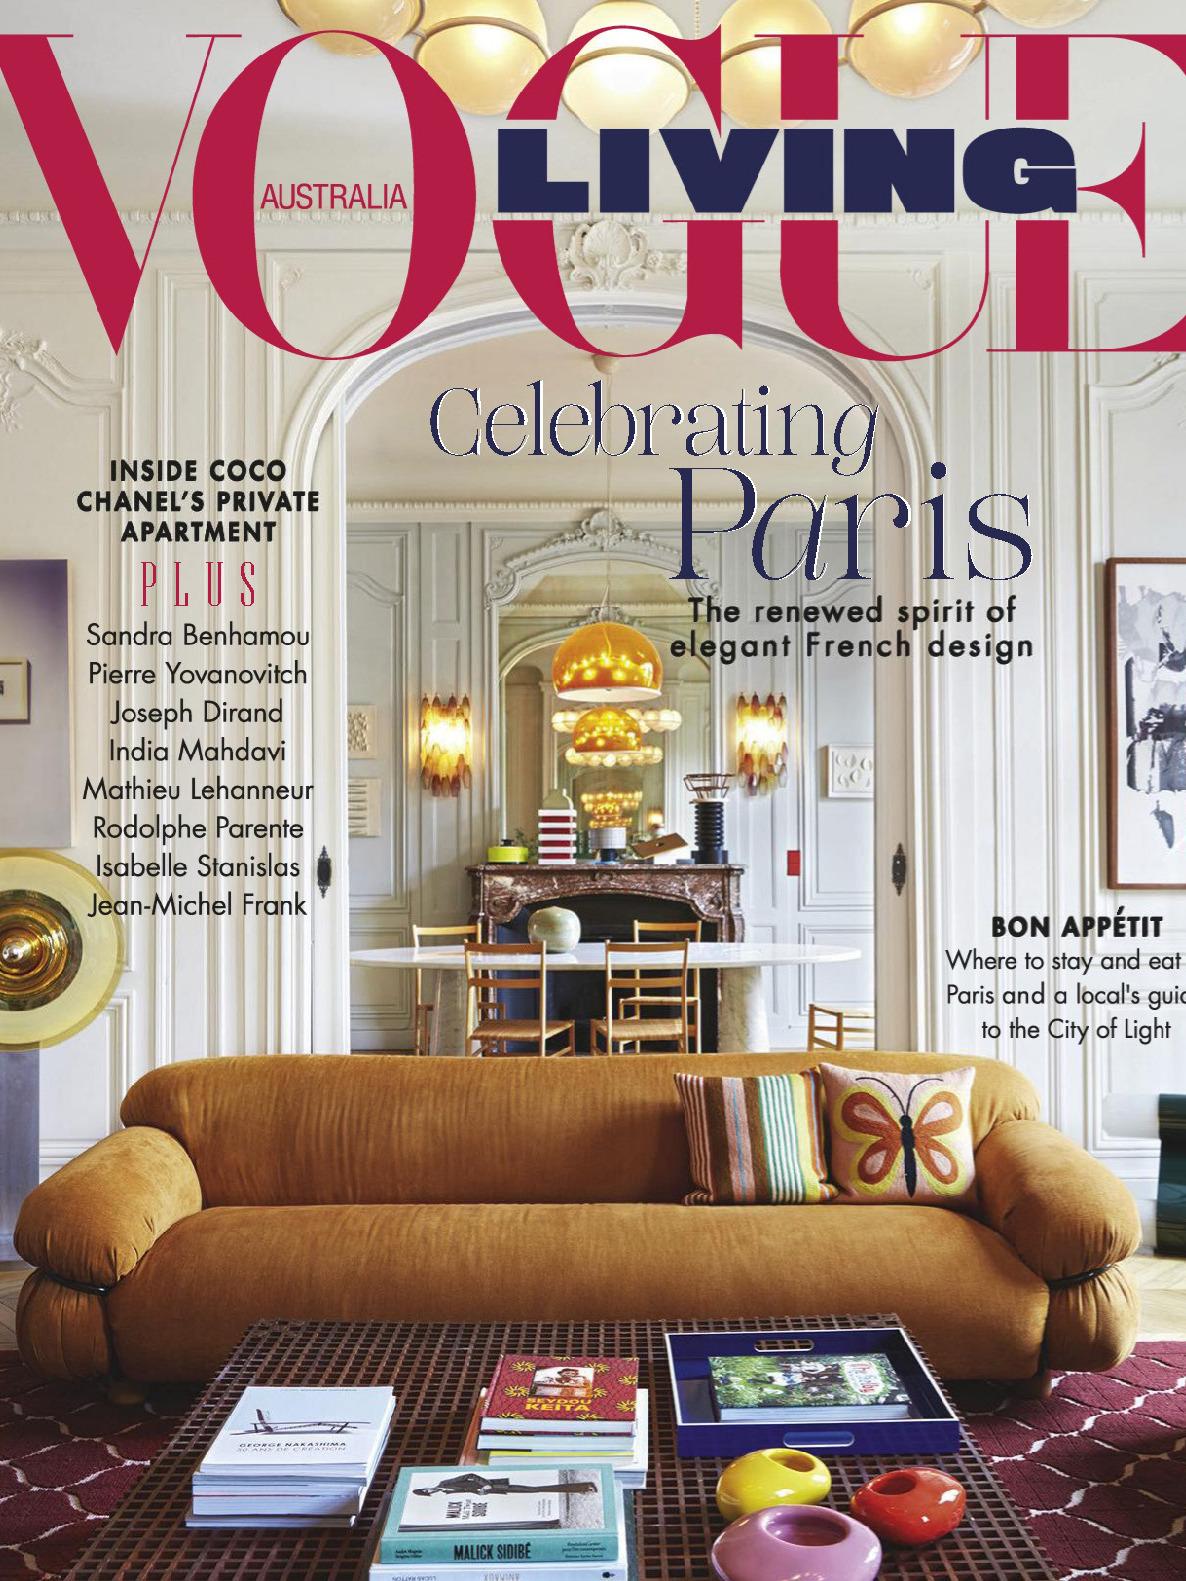 《Vogue Living》澳大利亚版时尚家居设计杂志2019年11-12月号